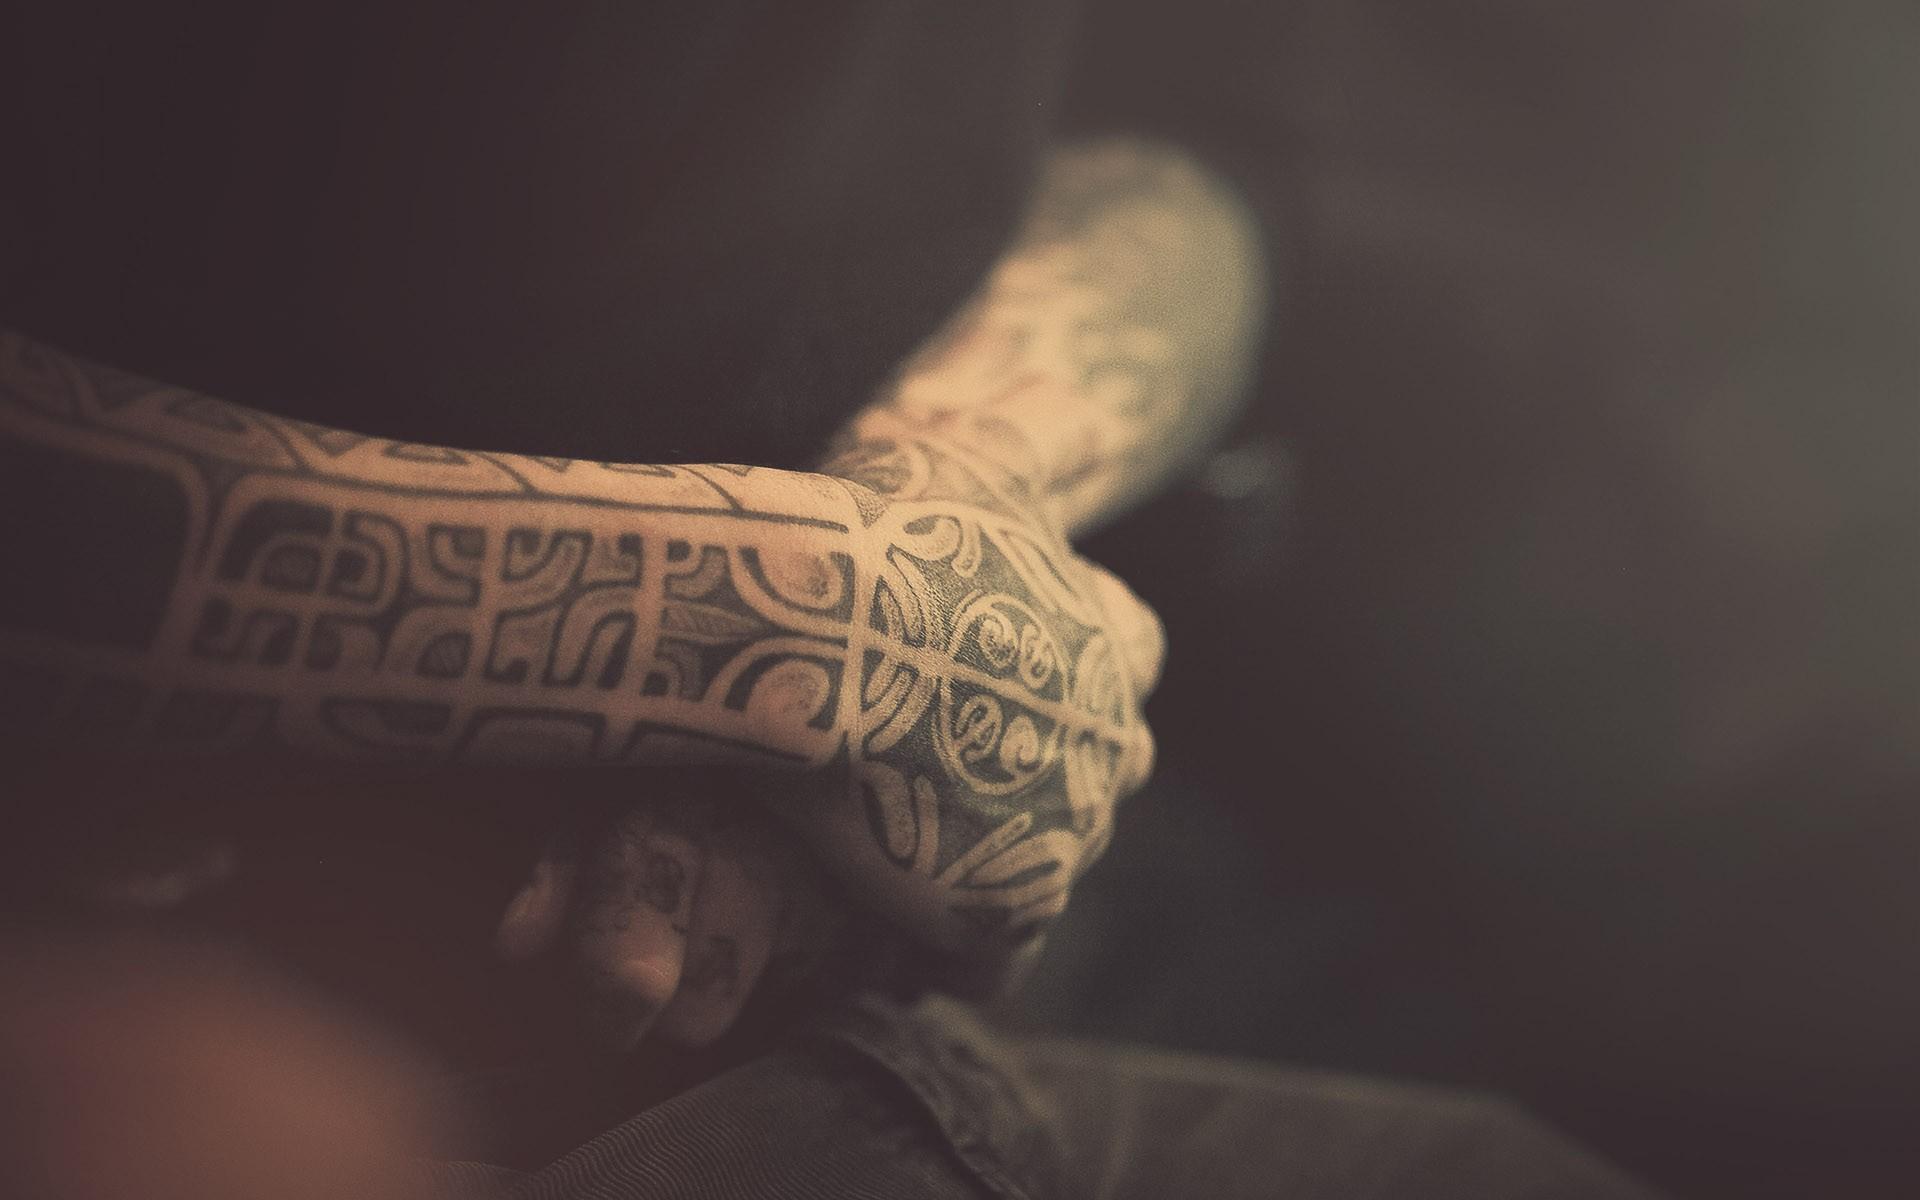 Aman Durga Sipatiti (a tattoo artist based in Jakarta ...